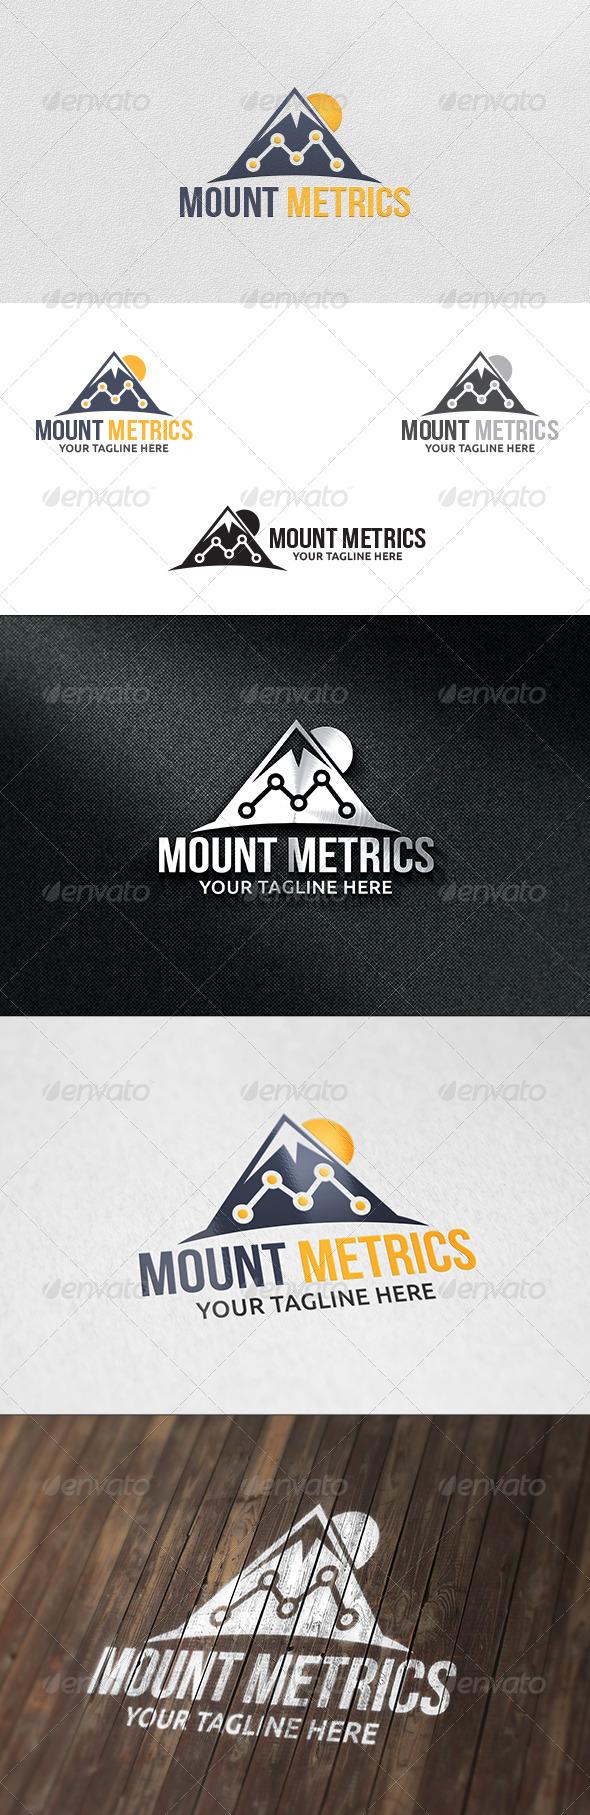 Mountain Metrics - Logo Template